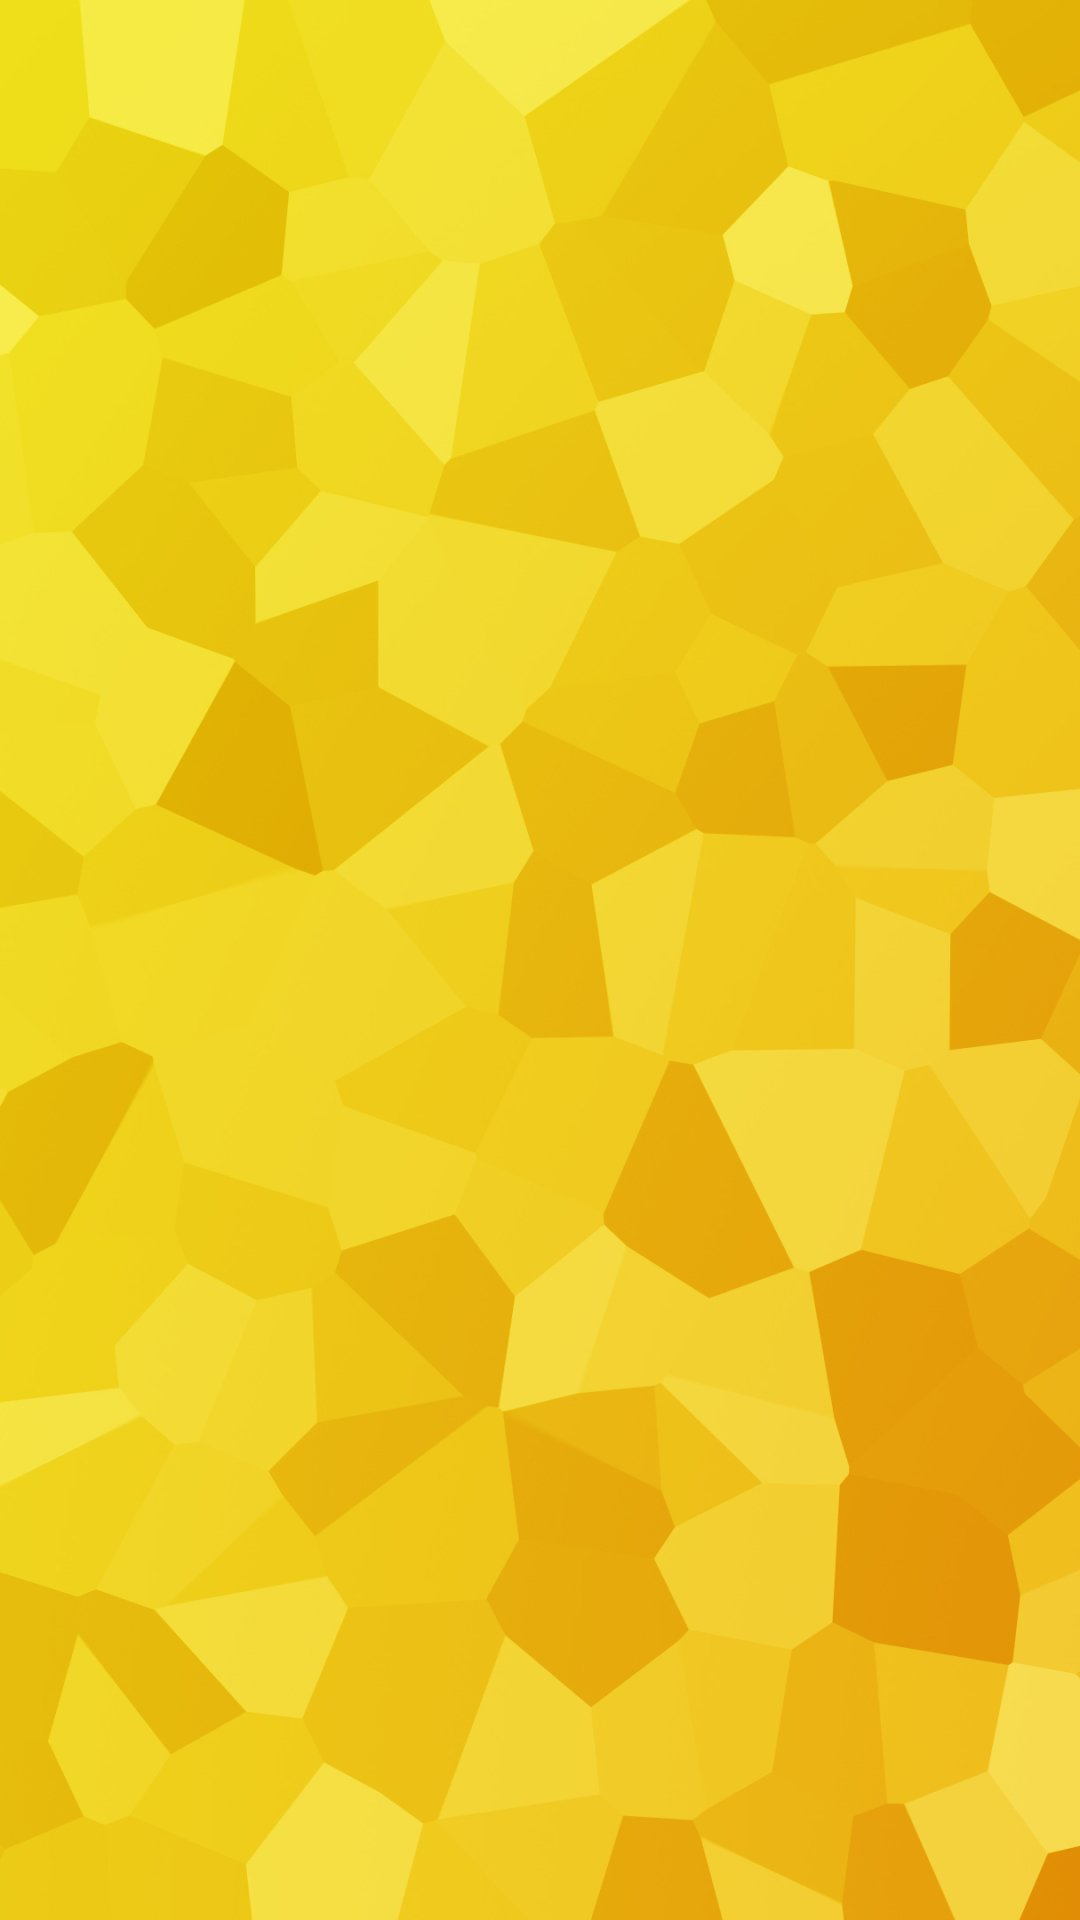 Wallpaper 844074